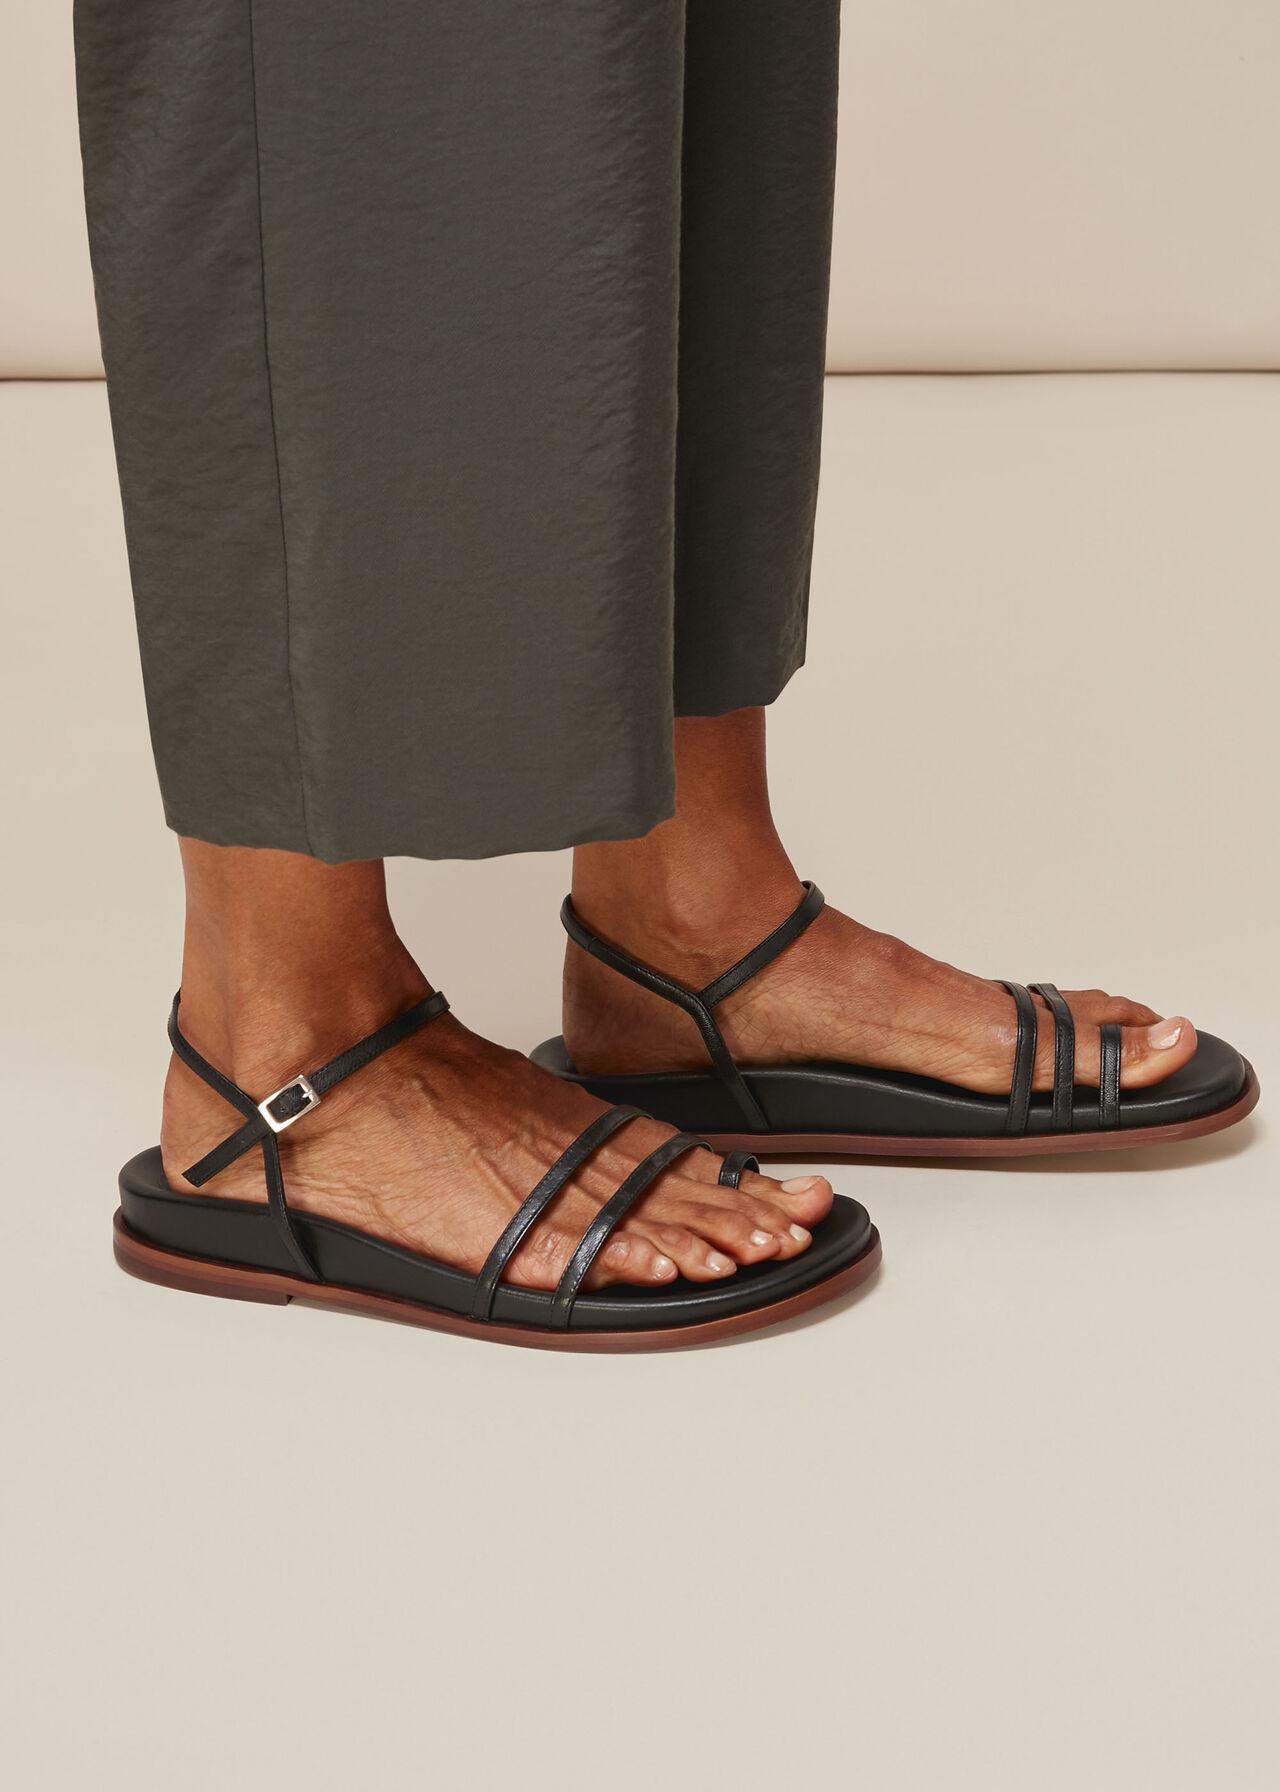 Isobel Strappy Footbed Sandal Black